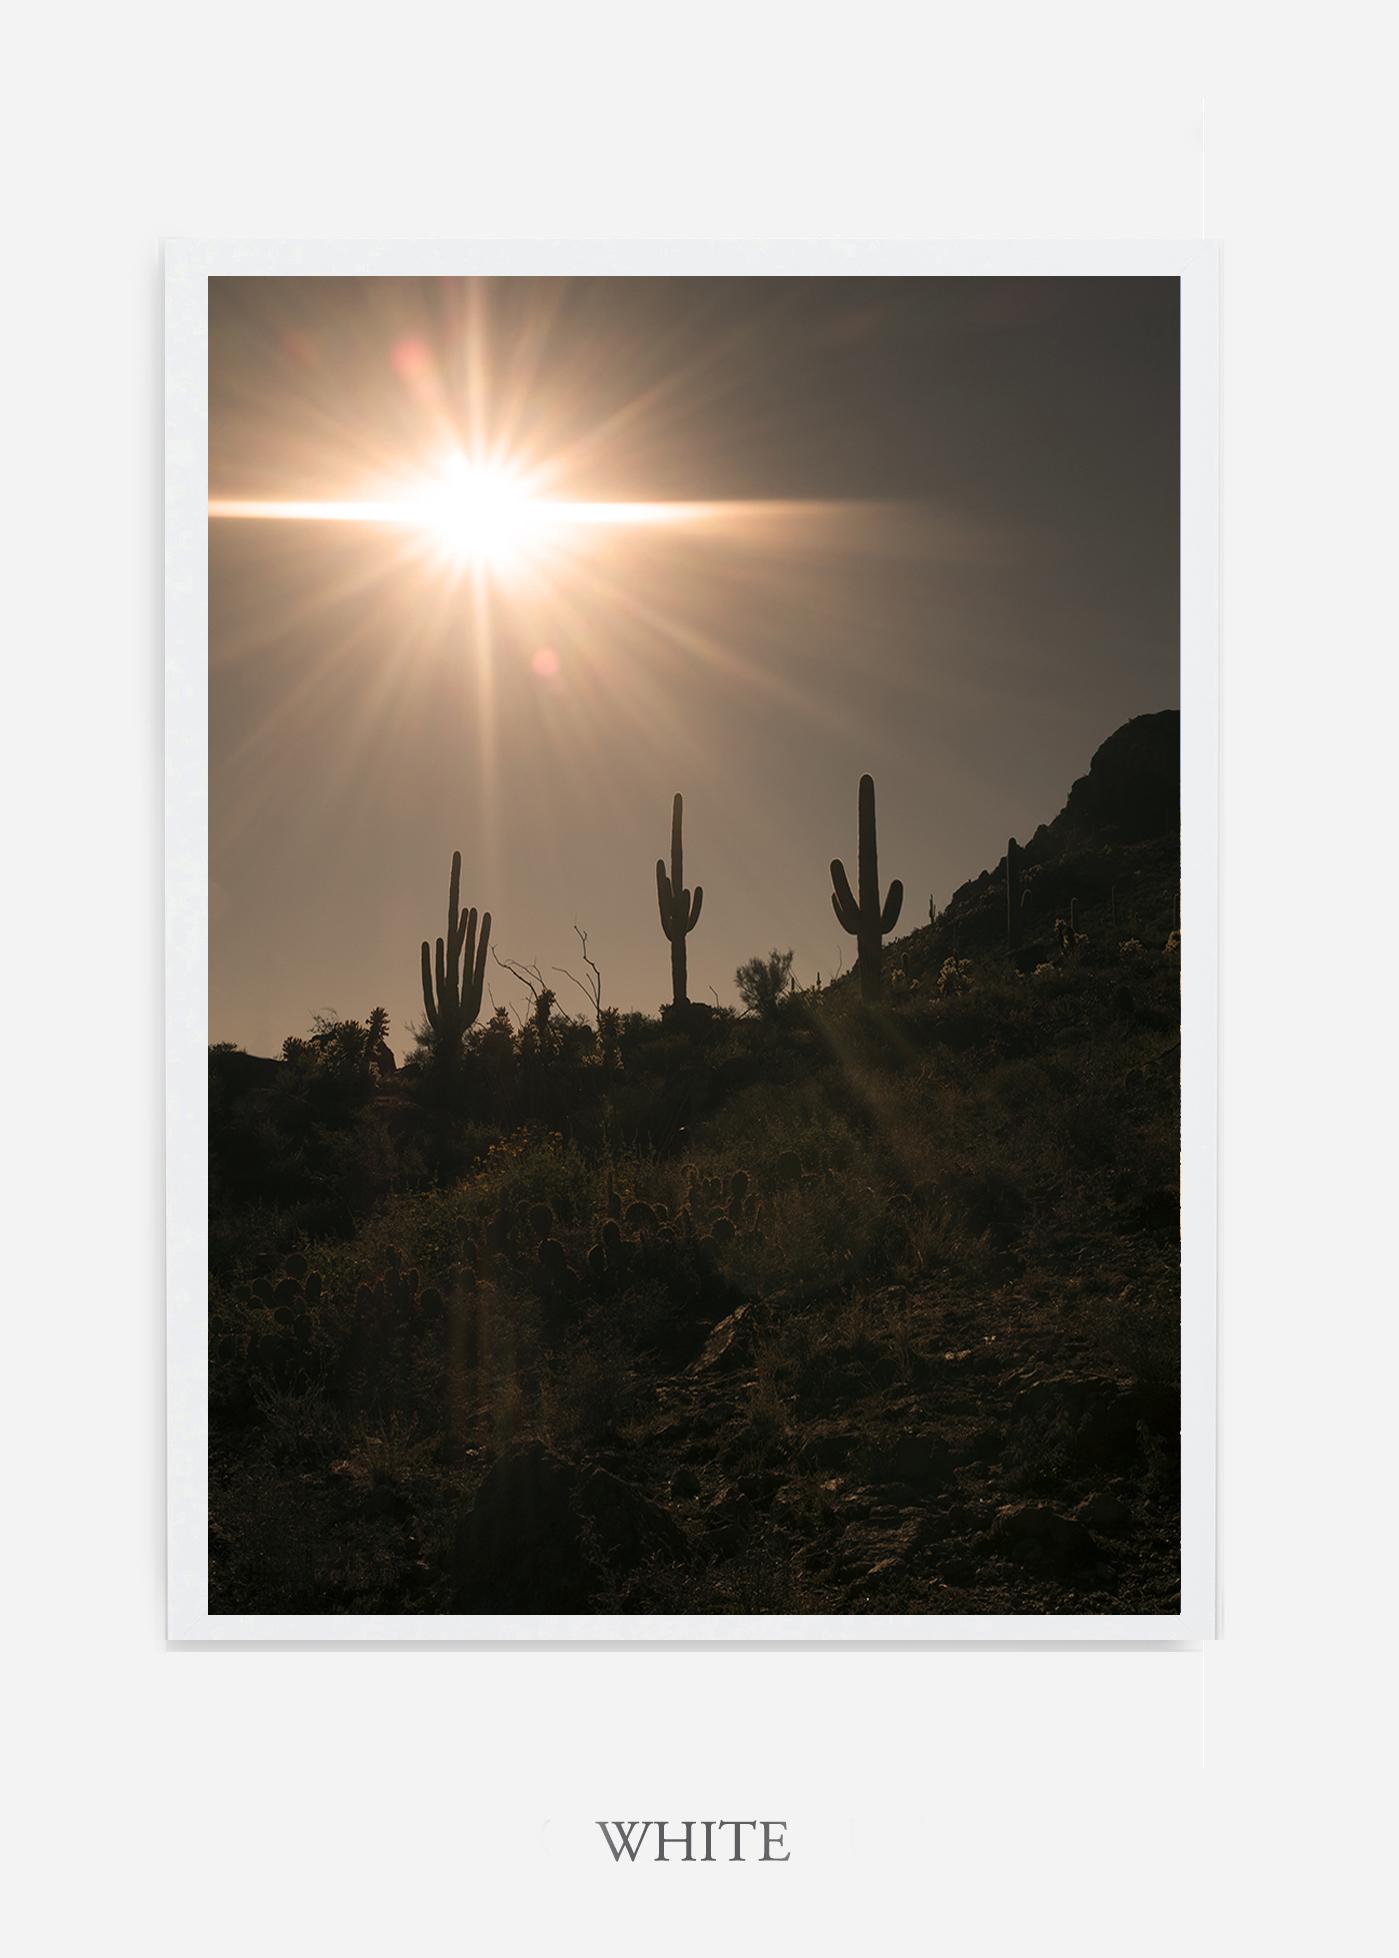 nomat-whiteframe-saguaroNo.16-wildercalifornia-art-wallart-cactusprint-homedecor-prints-arizona-botanical-artwork-interiordesign.jpg